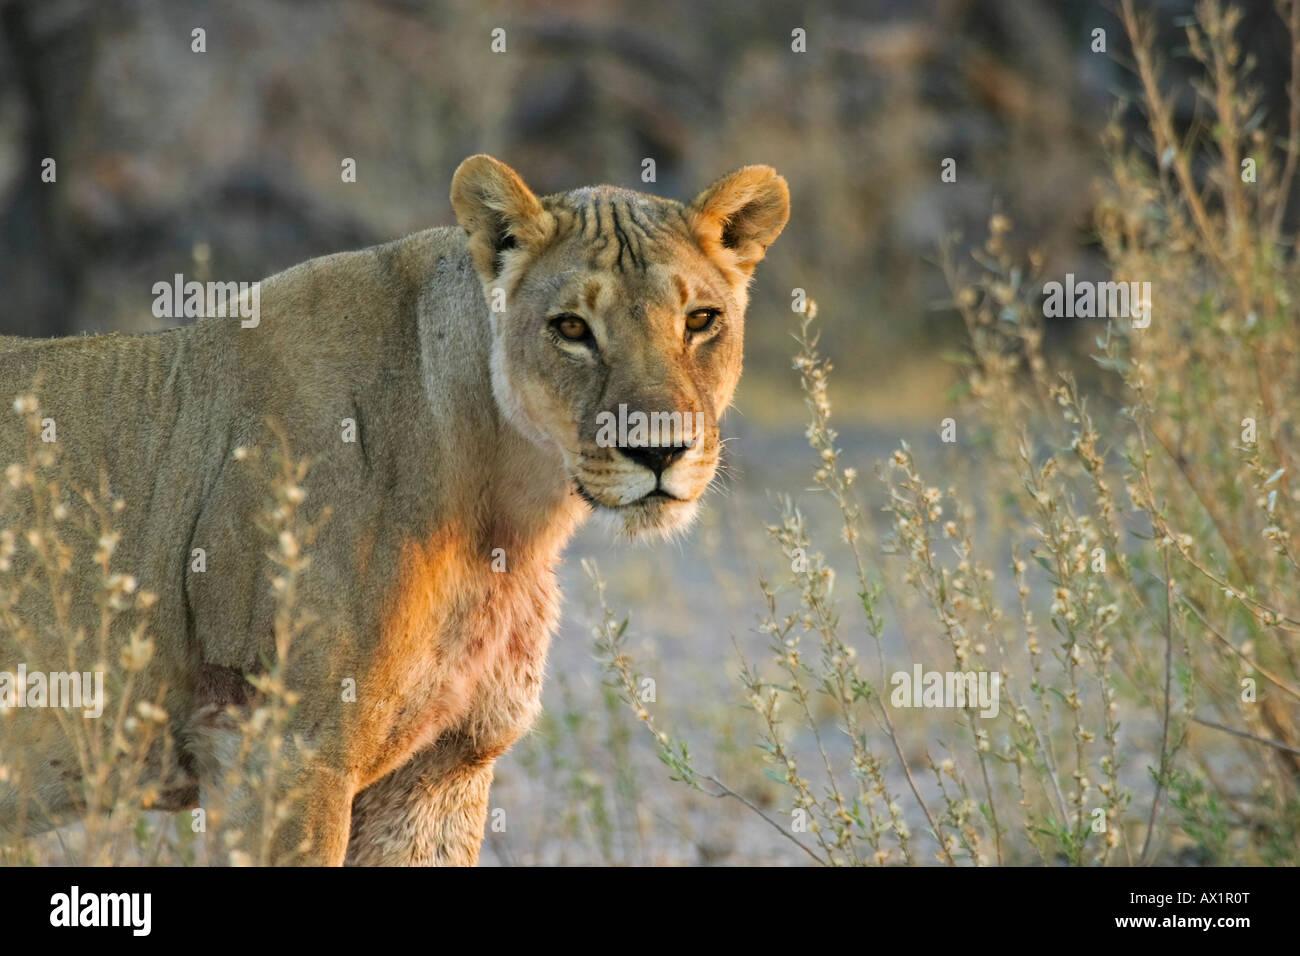 Lioness (Panthera leo) Nxai Pan, Makgadikgadi Pans National Park, Botswana, Africa Stock Photo